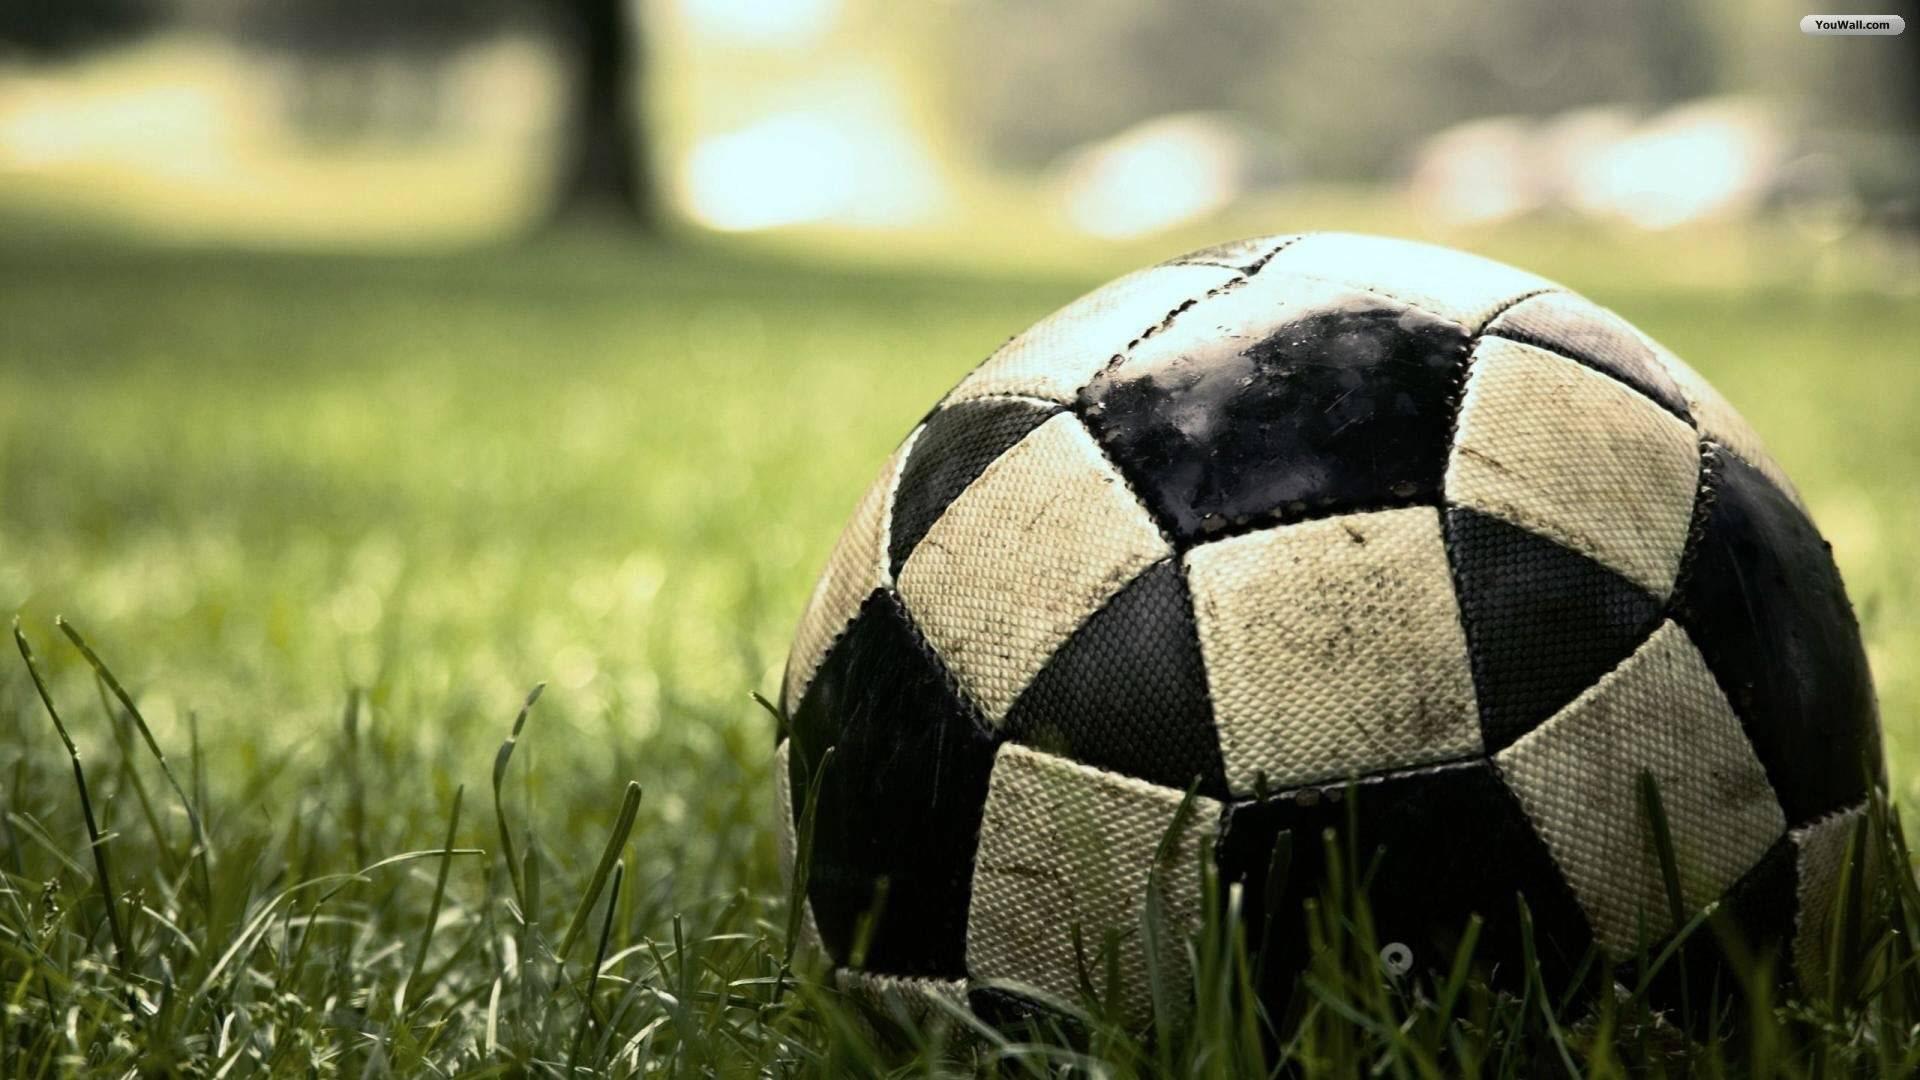 Soccer HD Wallpapers - Wallpaper Cave Soccer